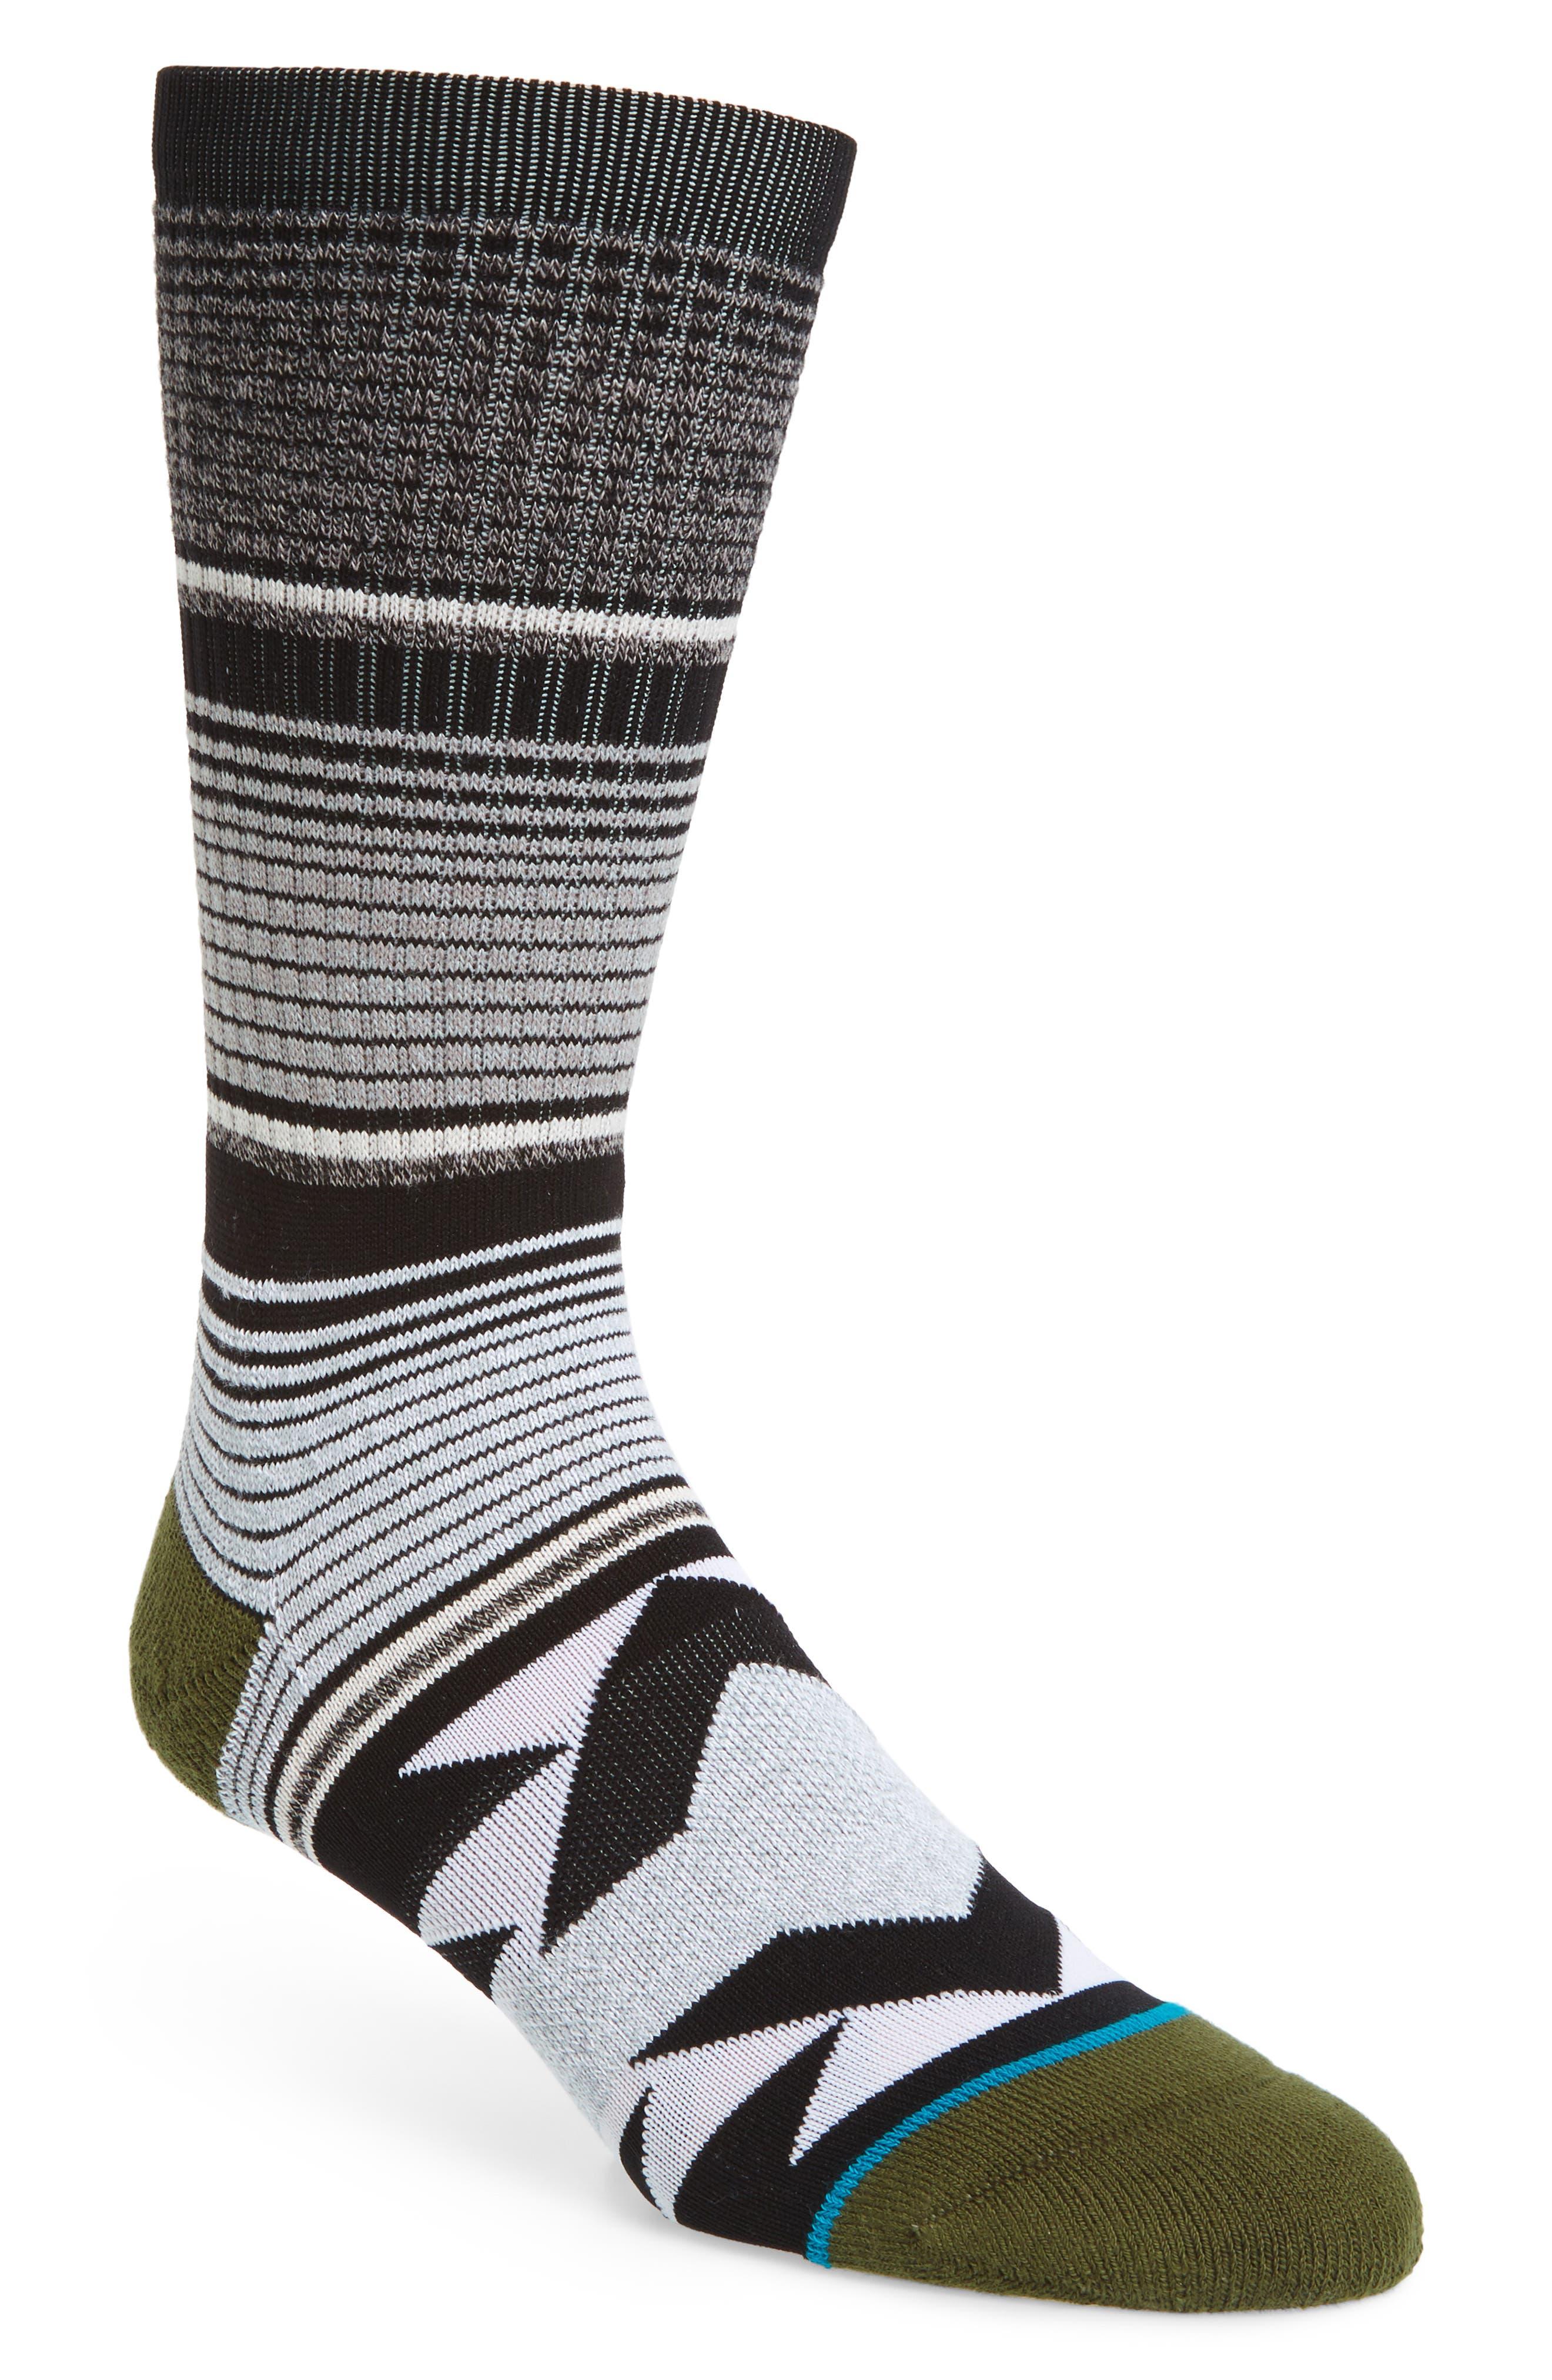 San Blas Crew Socks,                             Main thumbnail 1, color,                             002